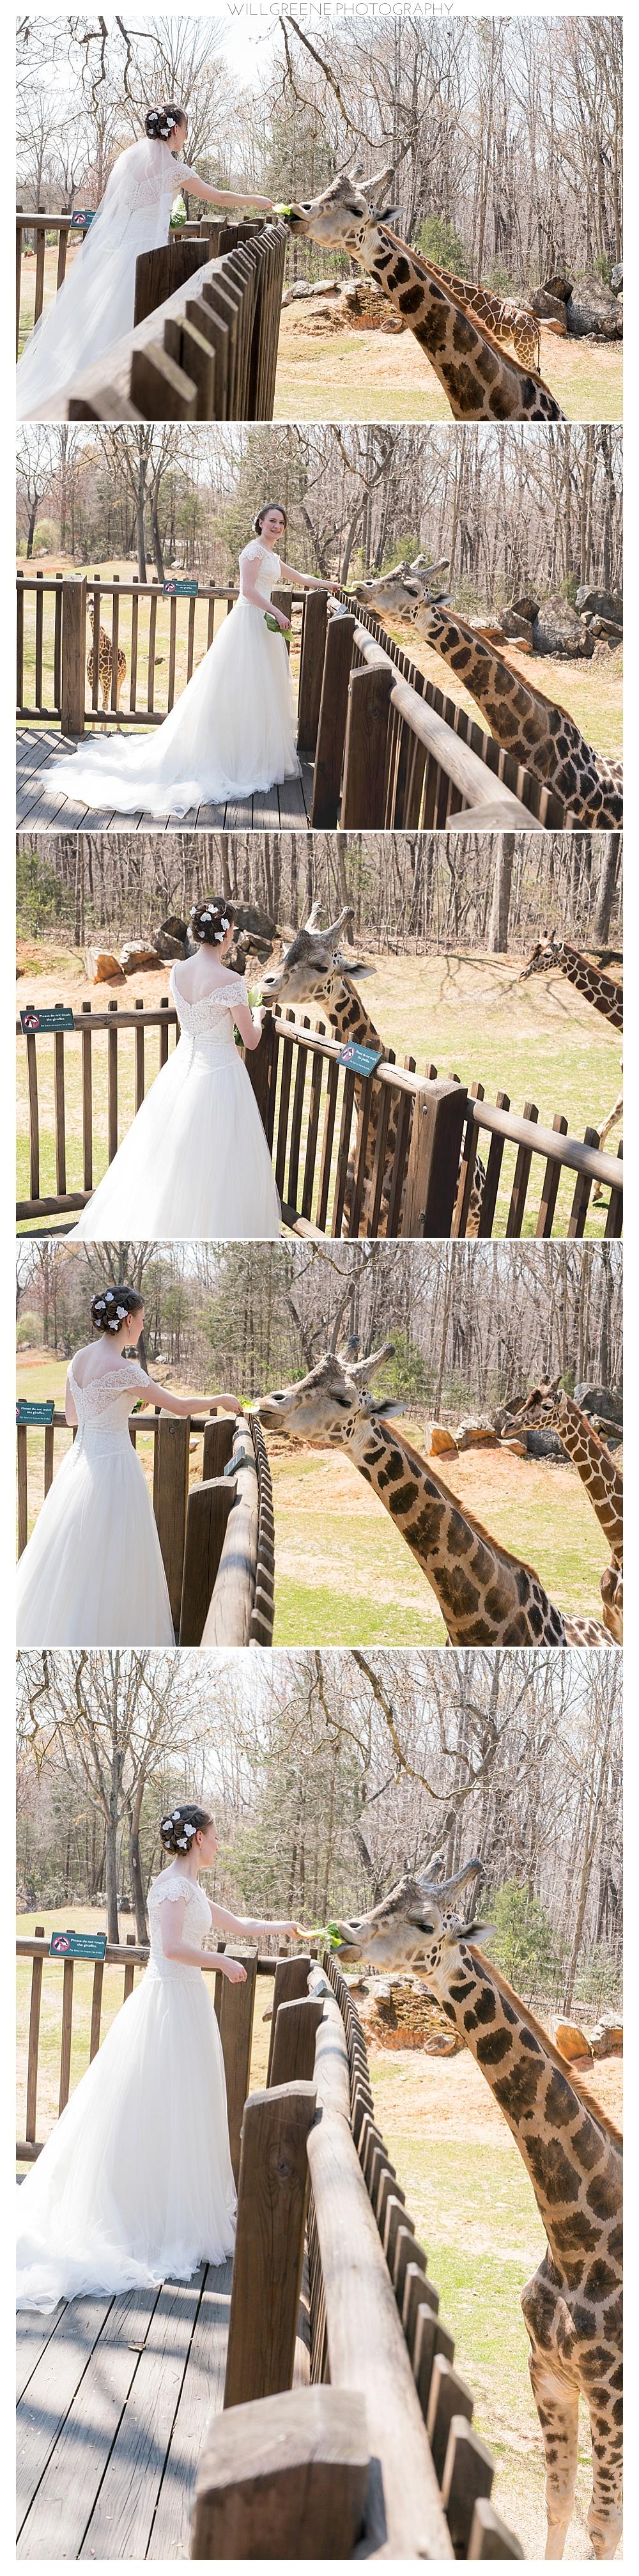 Molly's Nc Zoo Bridal Session Asheboro Will Greene Photography: Asheboro Nc Wedding Venues At Websimilar.org